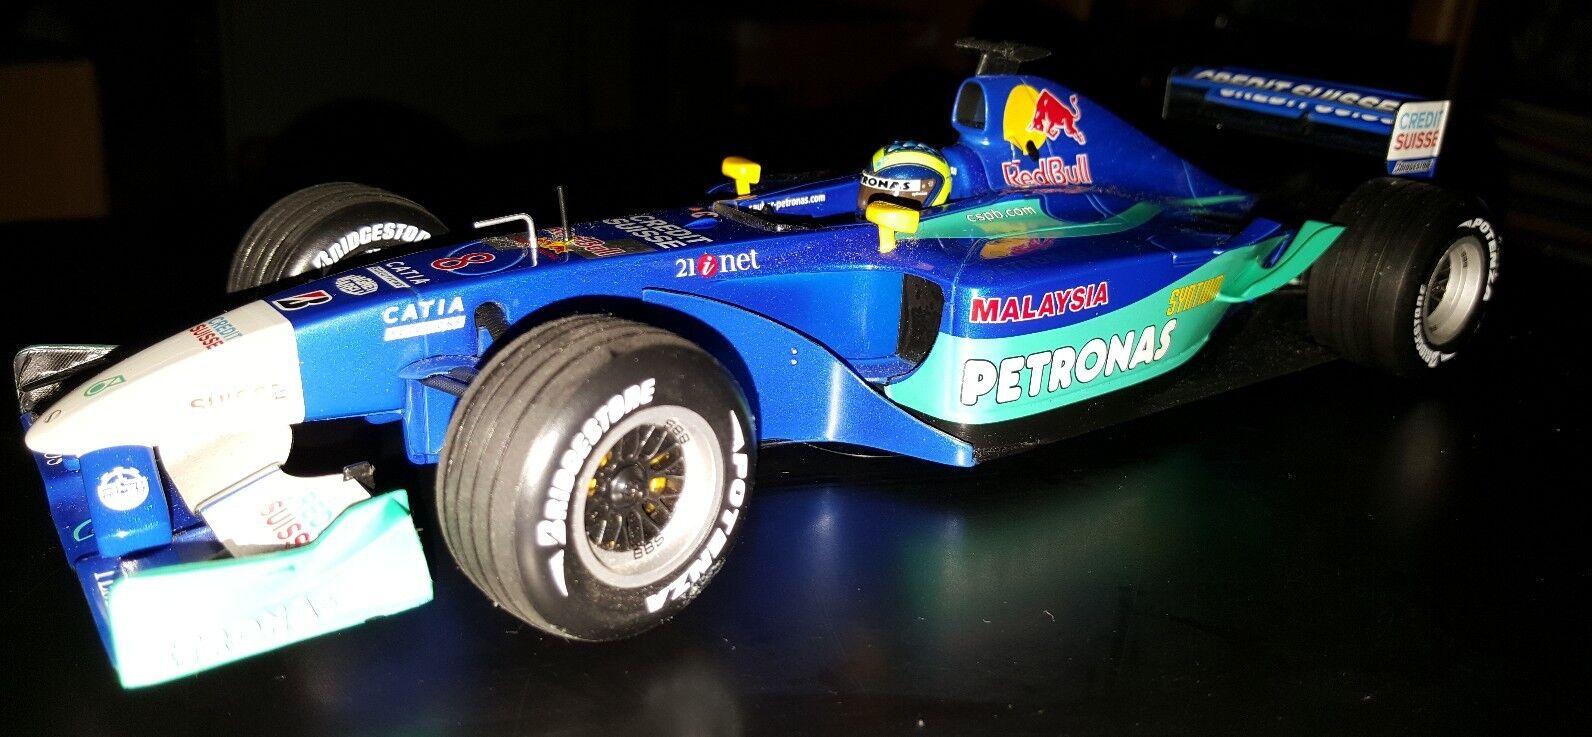 MINICHAMPS PMA propre-Petronas c21 2002  Felipe Massa  1 18